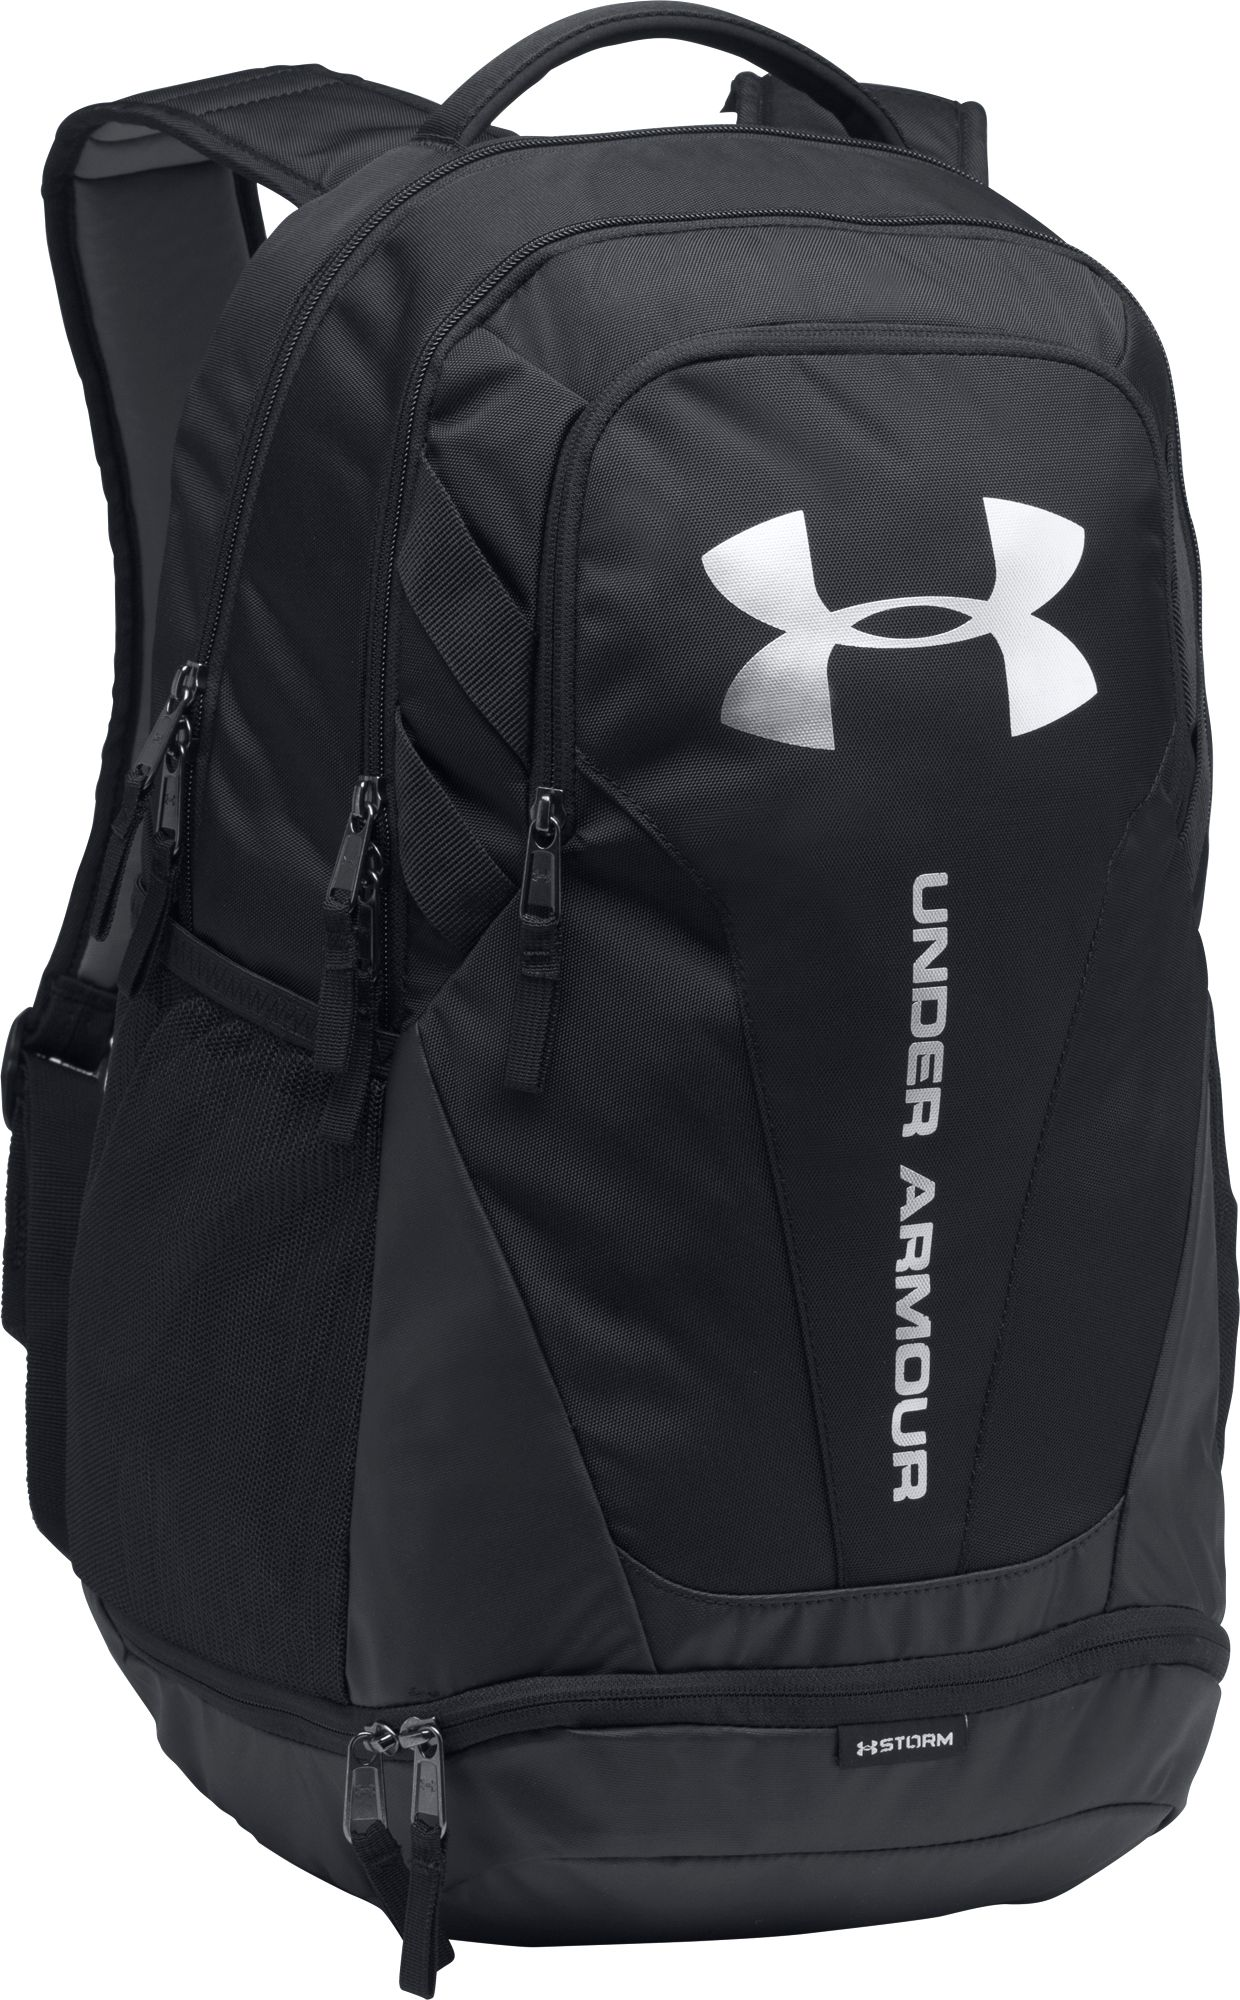 617e4d2891 Under Armour Hustle 3.0 Backpack